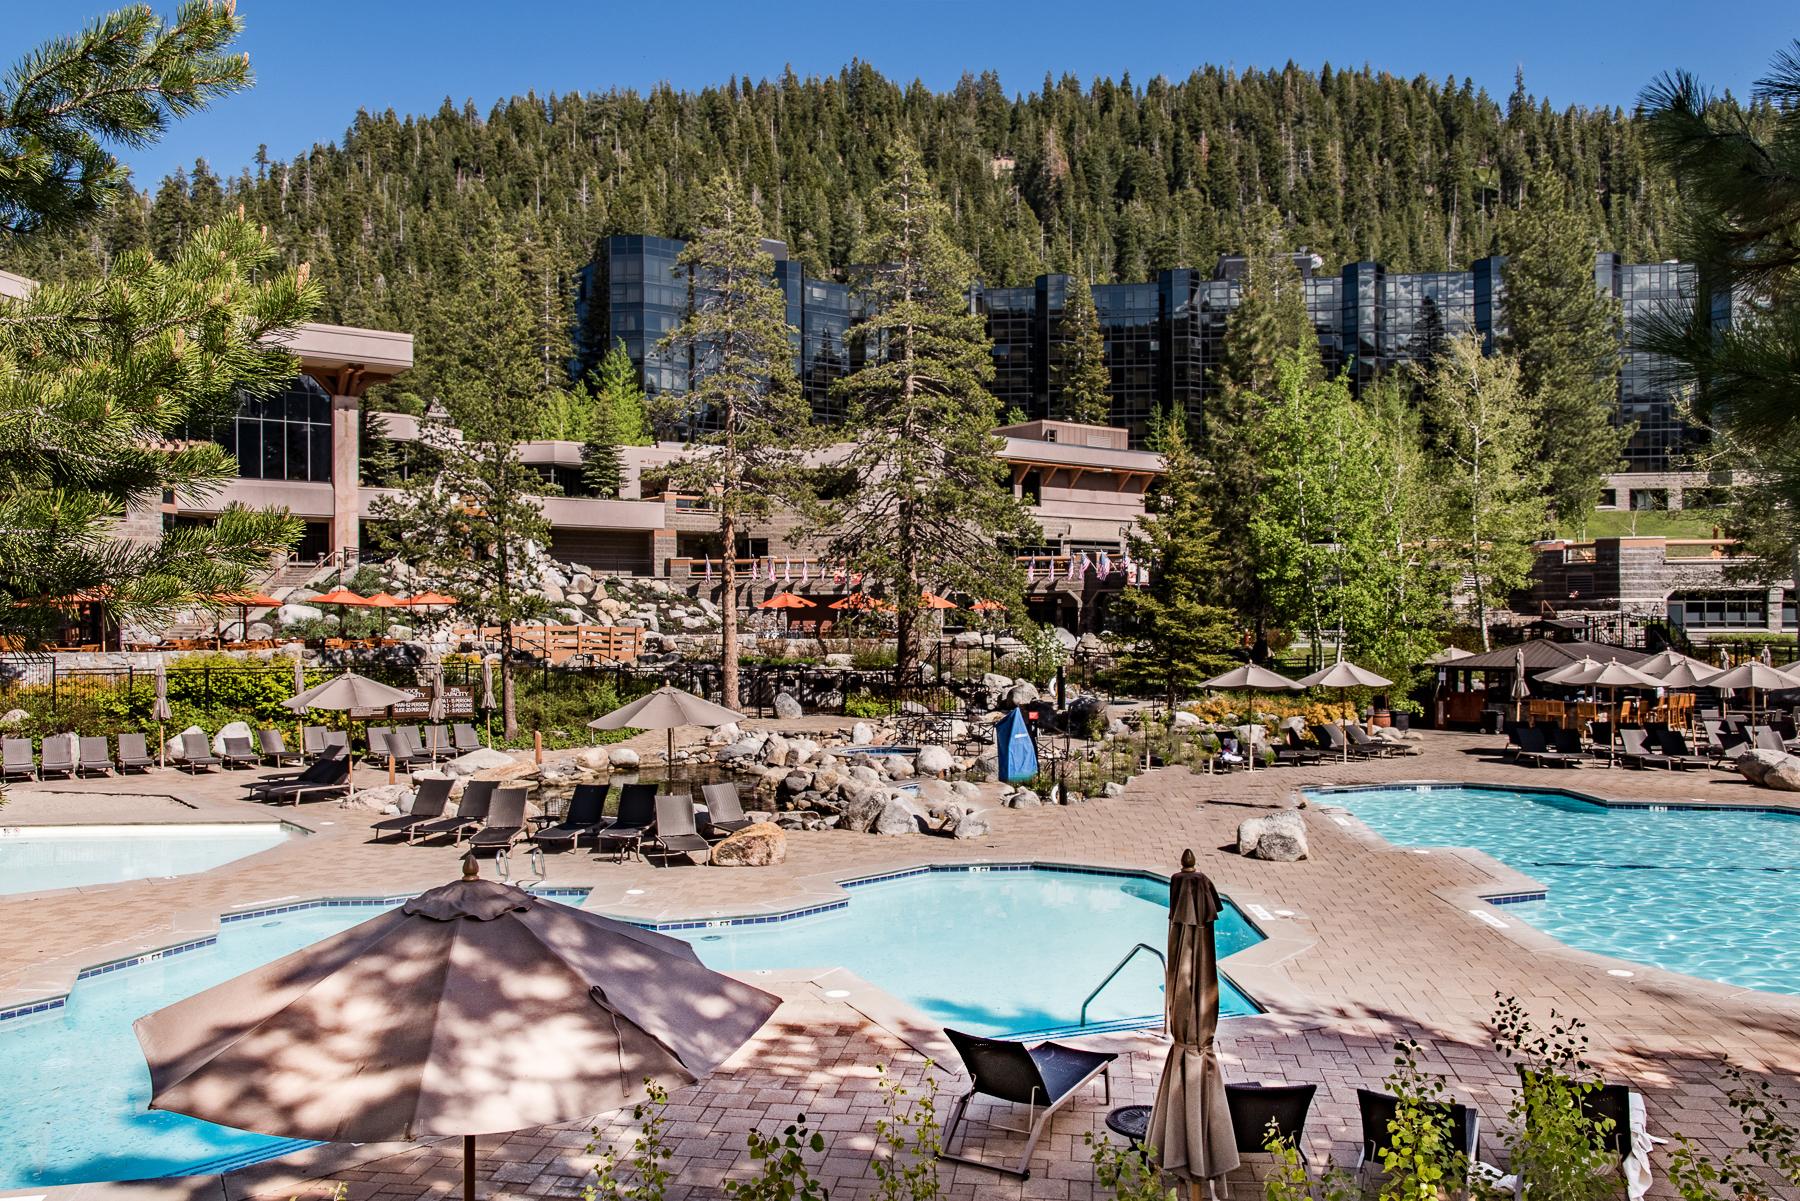 Image of The Resort at Squaw Creek, California